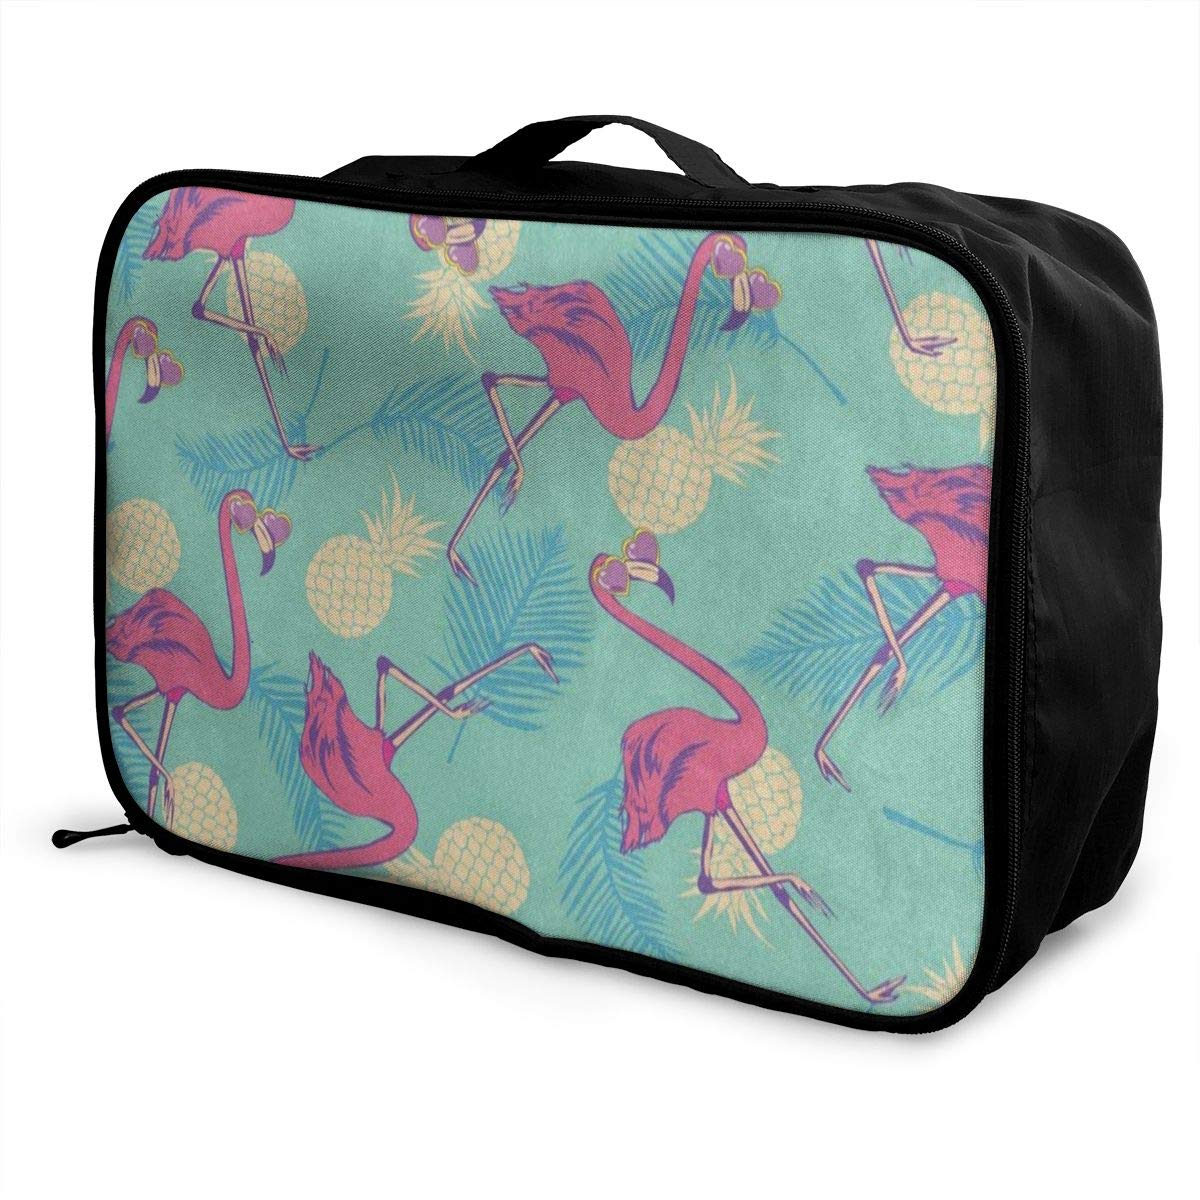 Luggage Bag Travel Duffel Bag Waterproof Vintage Wise Owl On Books Lightweight Large Capacity Portable Storage Bag